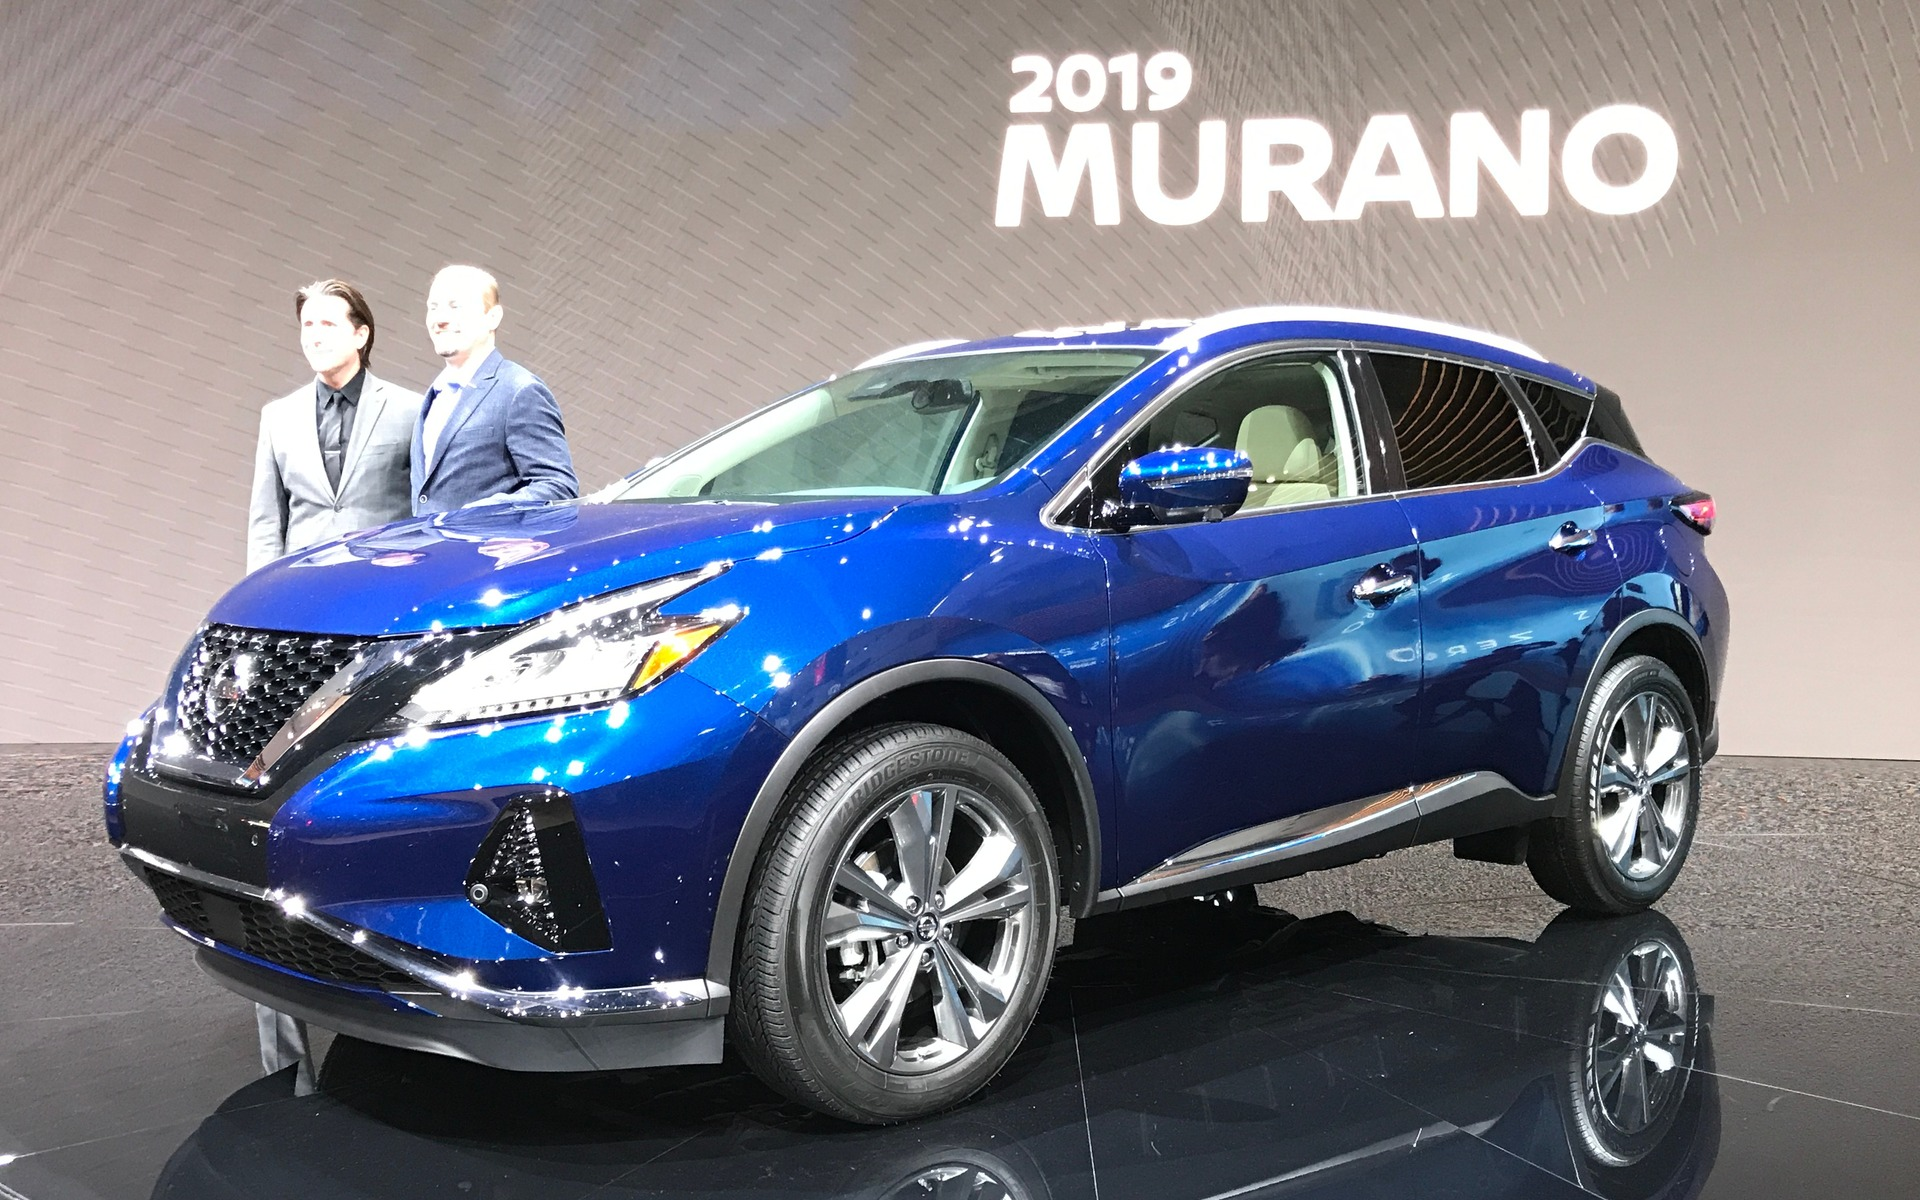 Nissan dévoile le Murano 2019 358524_2019_Nissan_Murano